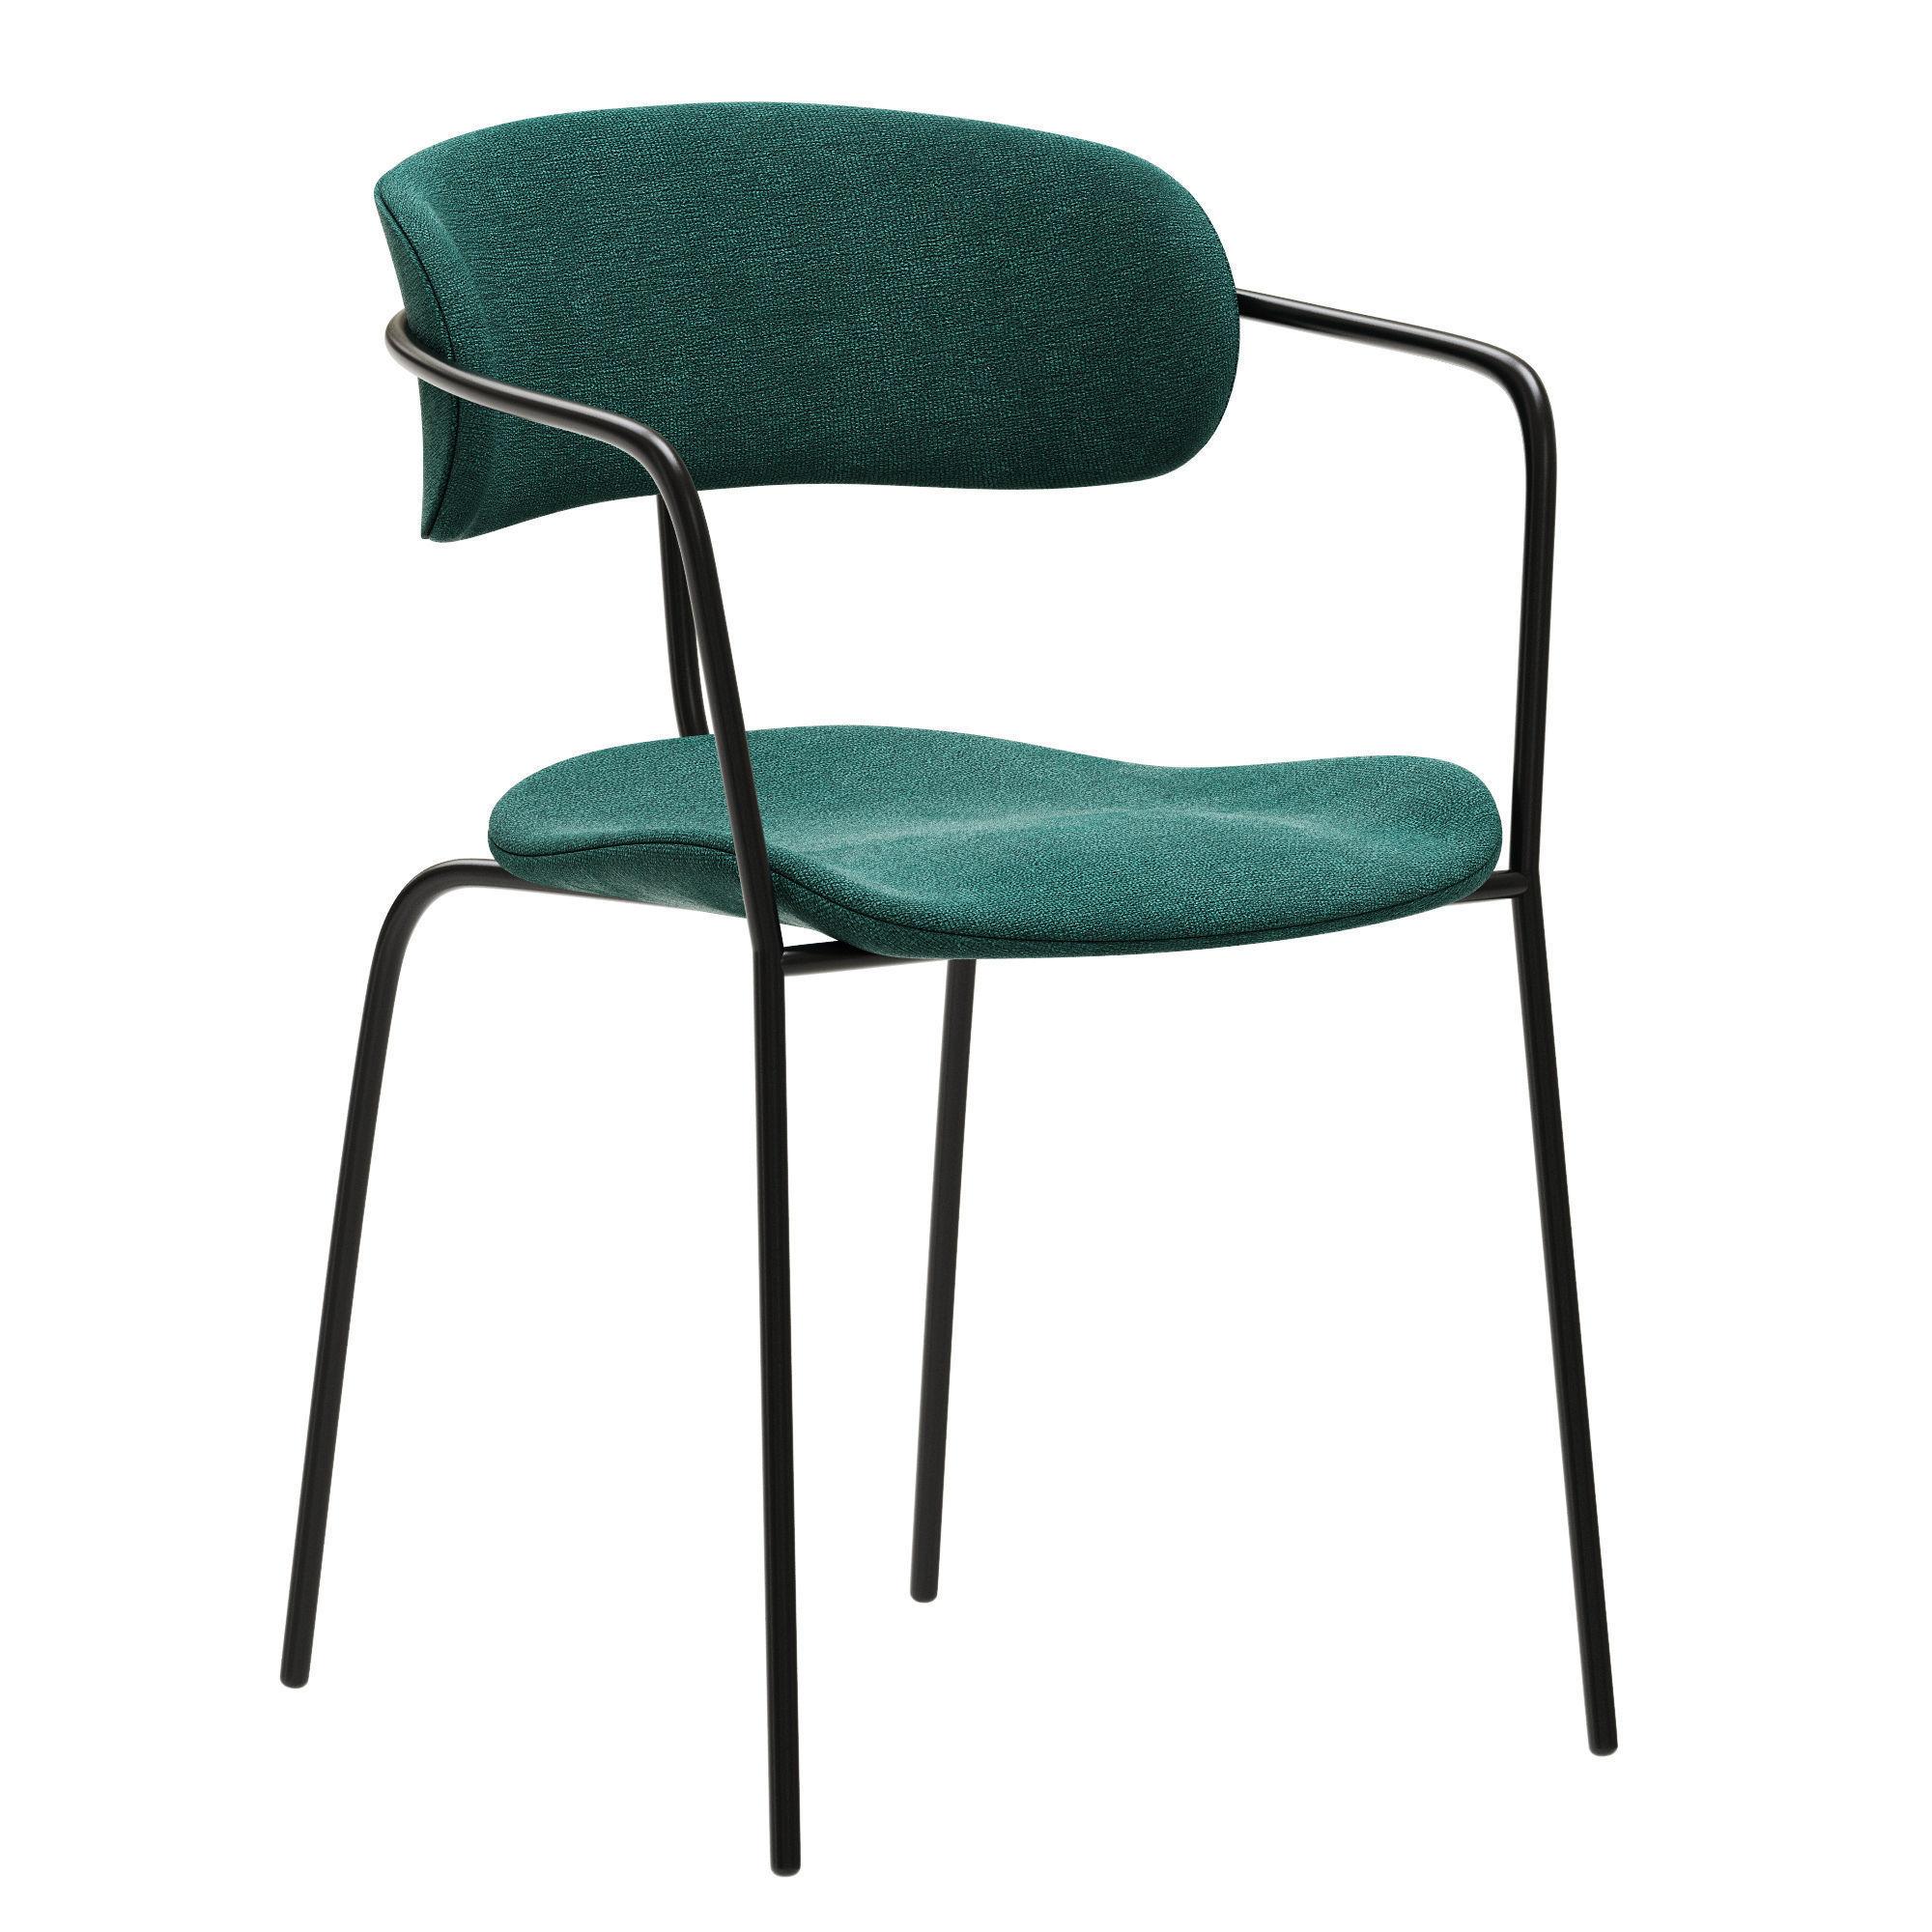 Dantone Home Adam chair